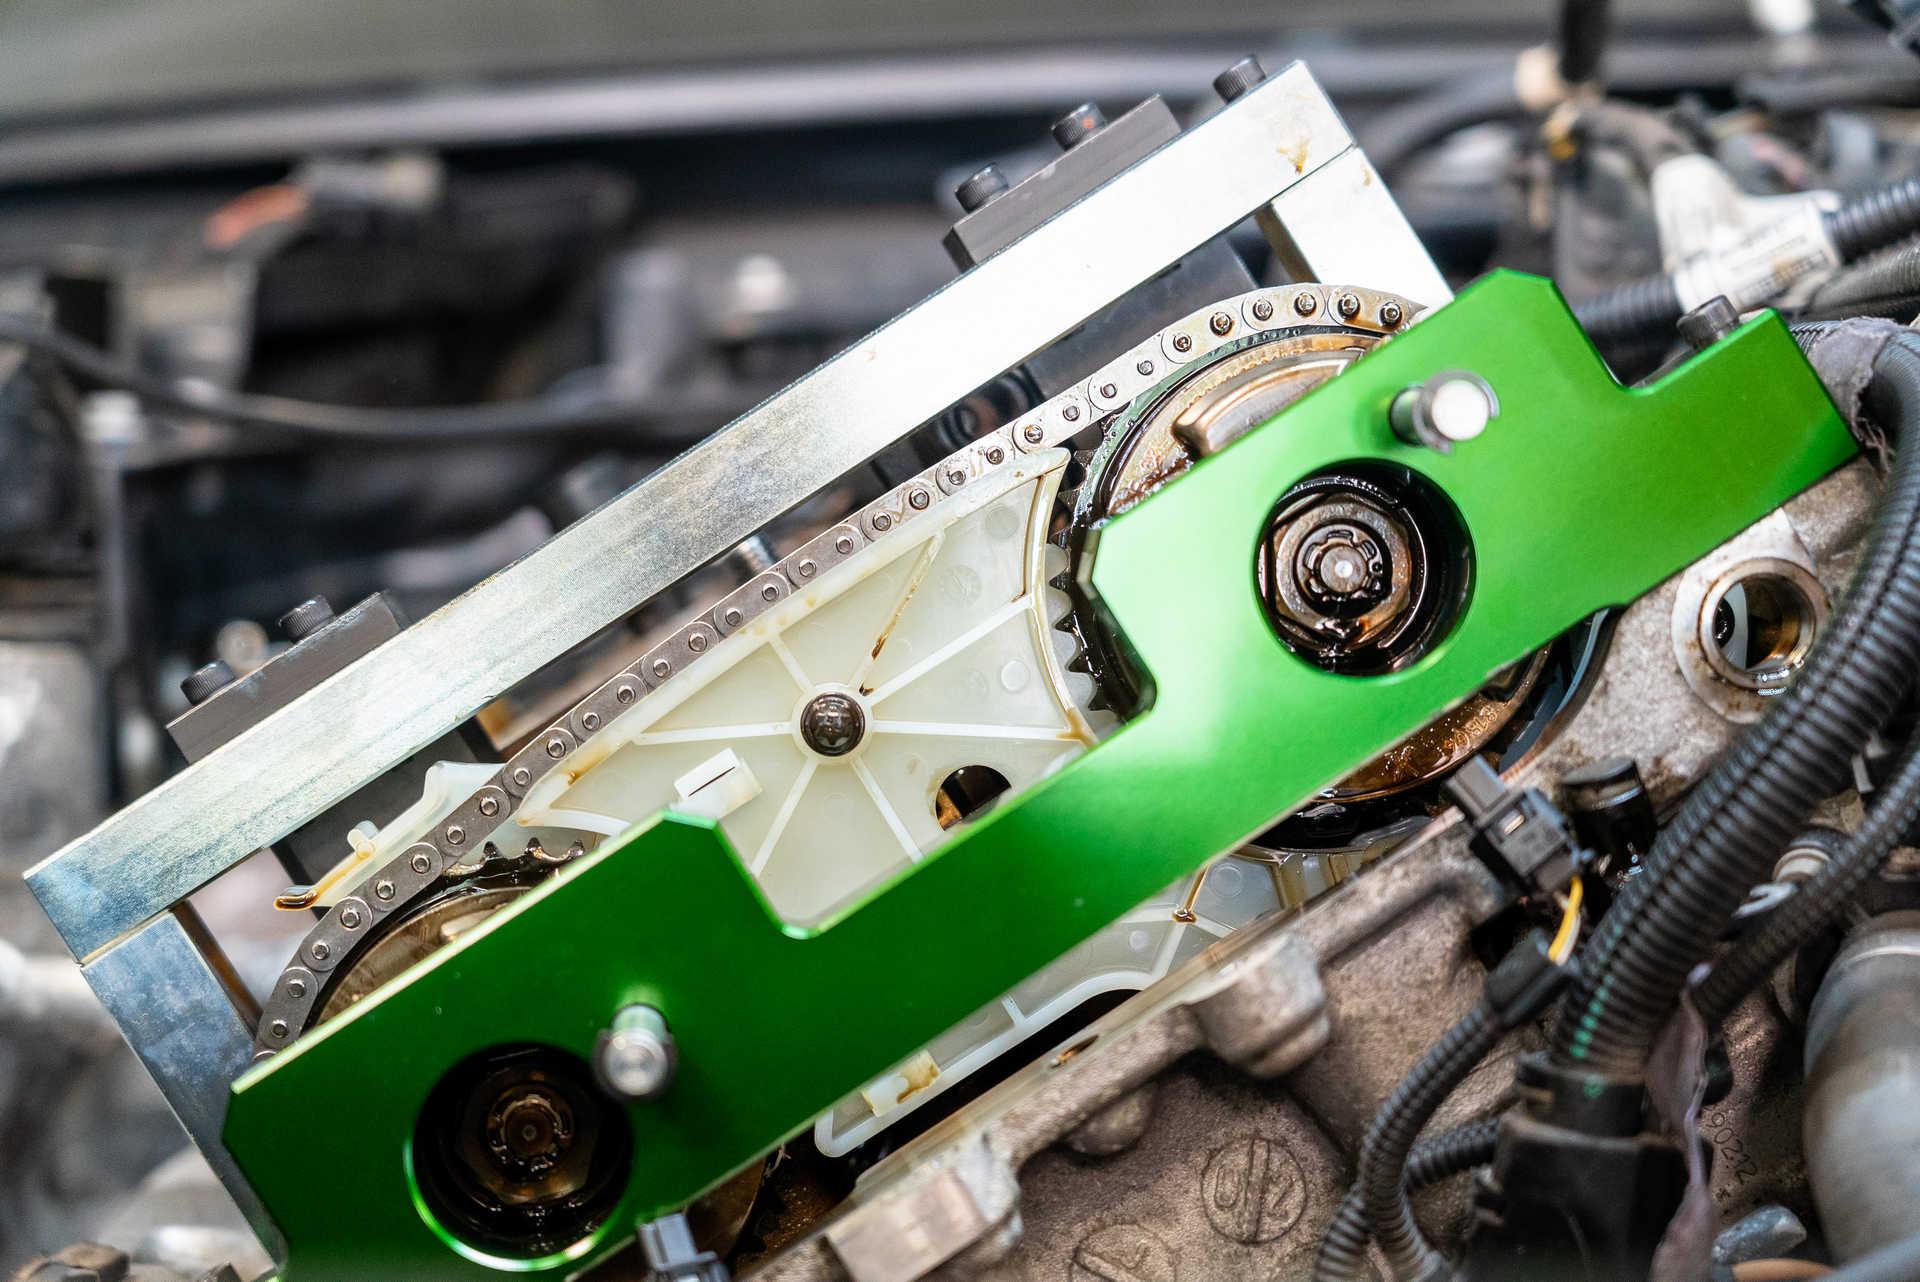 DIY BMW N20 Timing Chain timing the camshaft adjusters